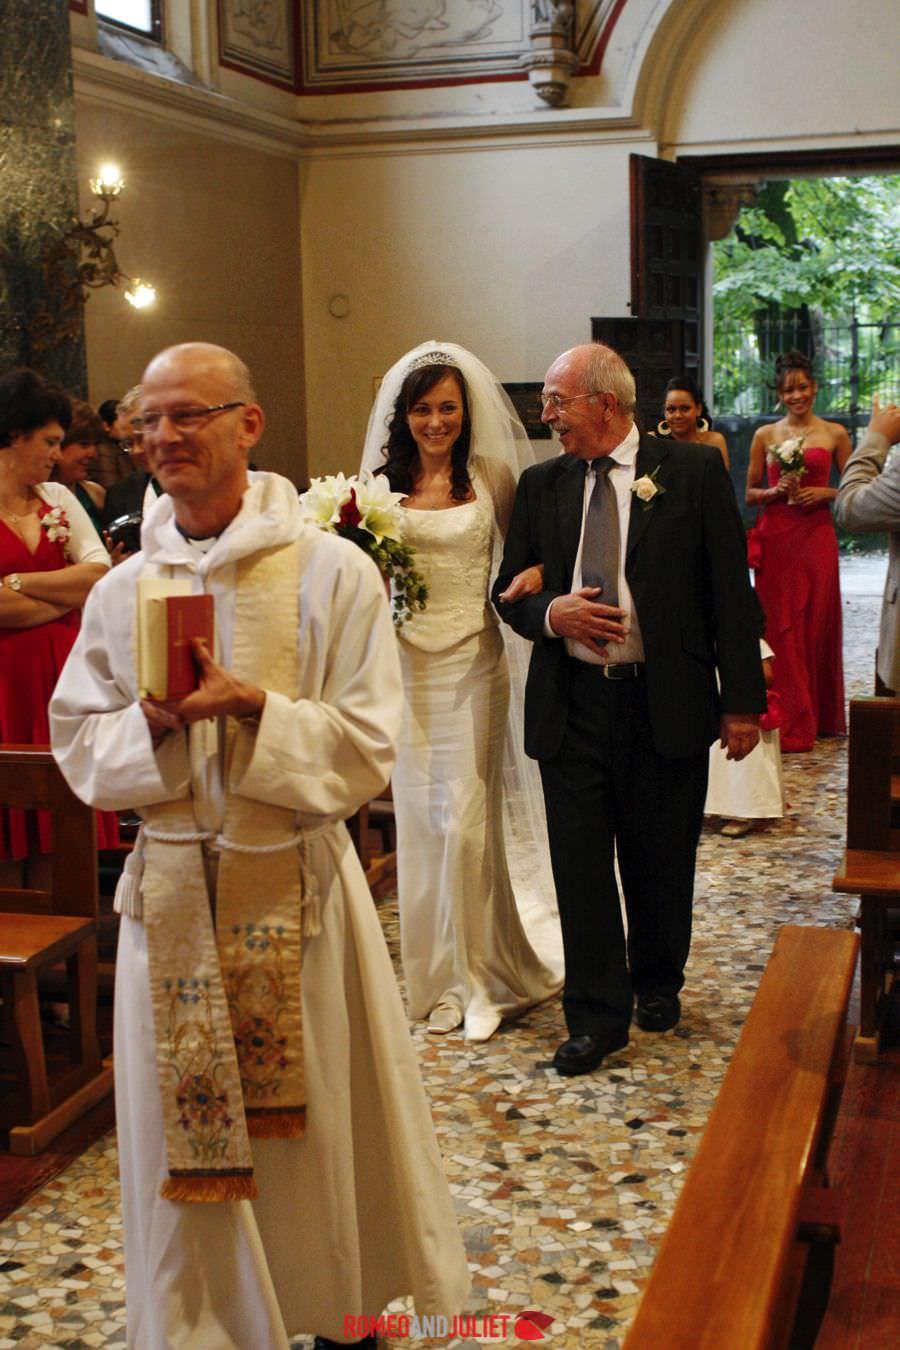 Anglican Church Wedding Of England